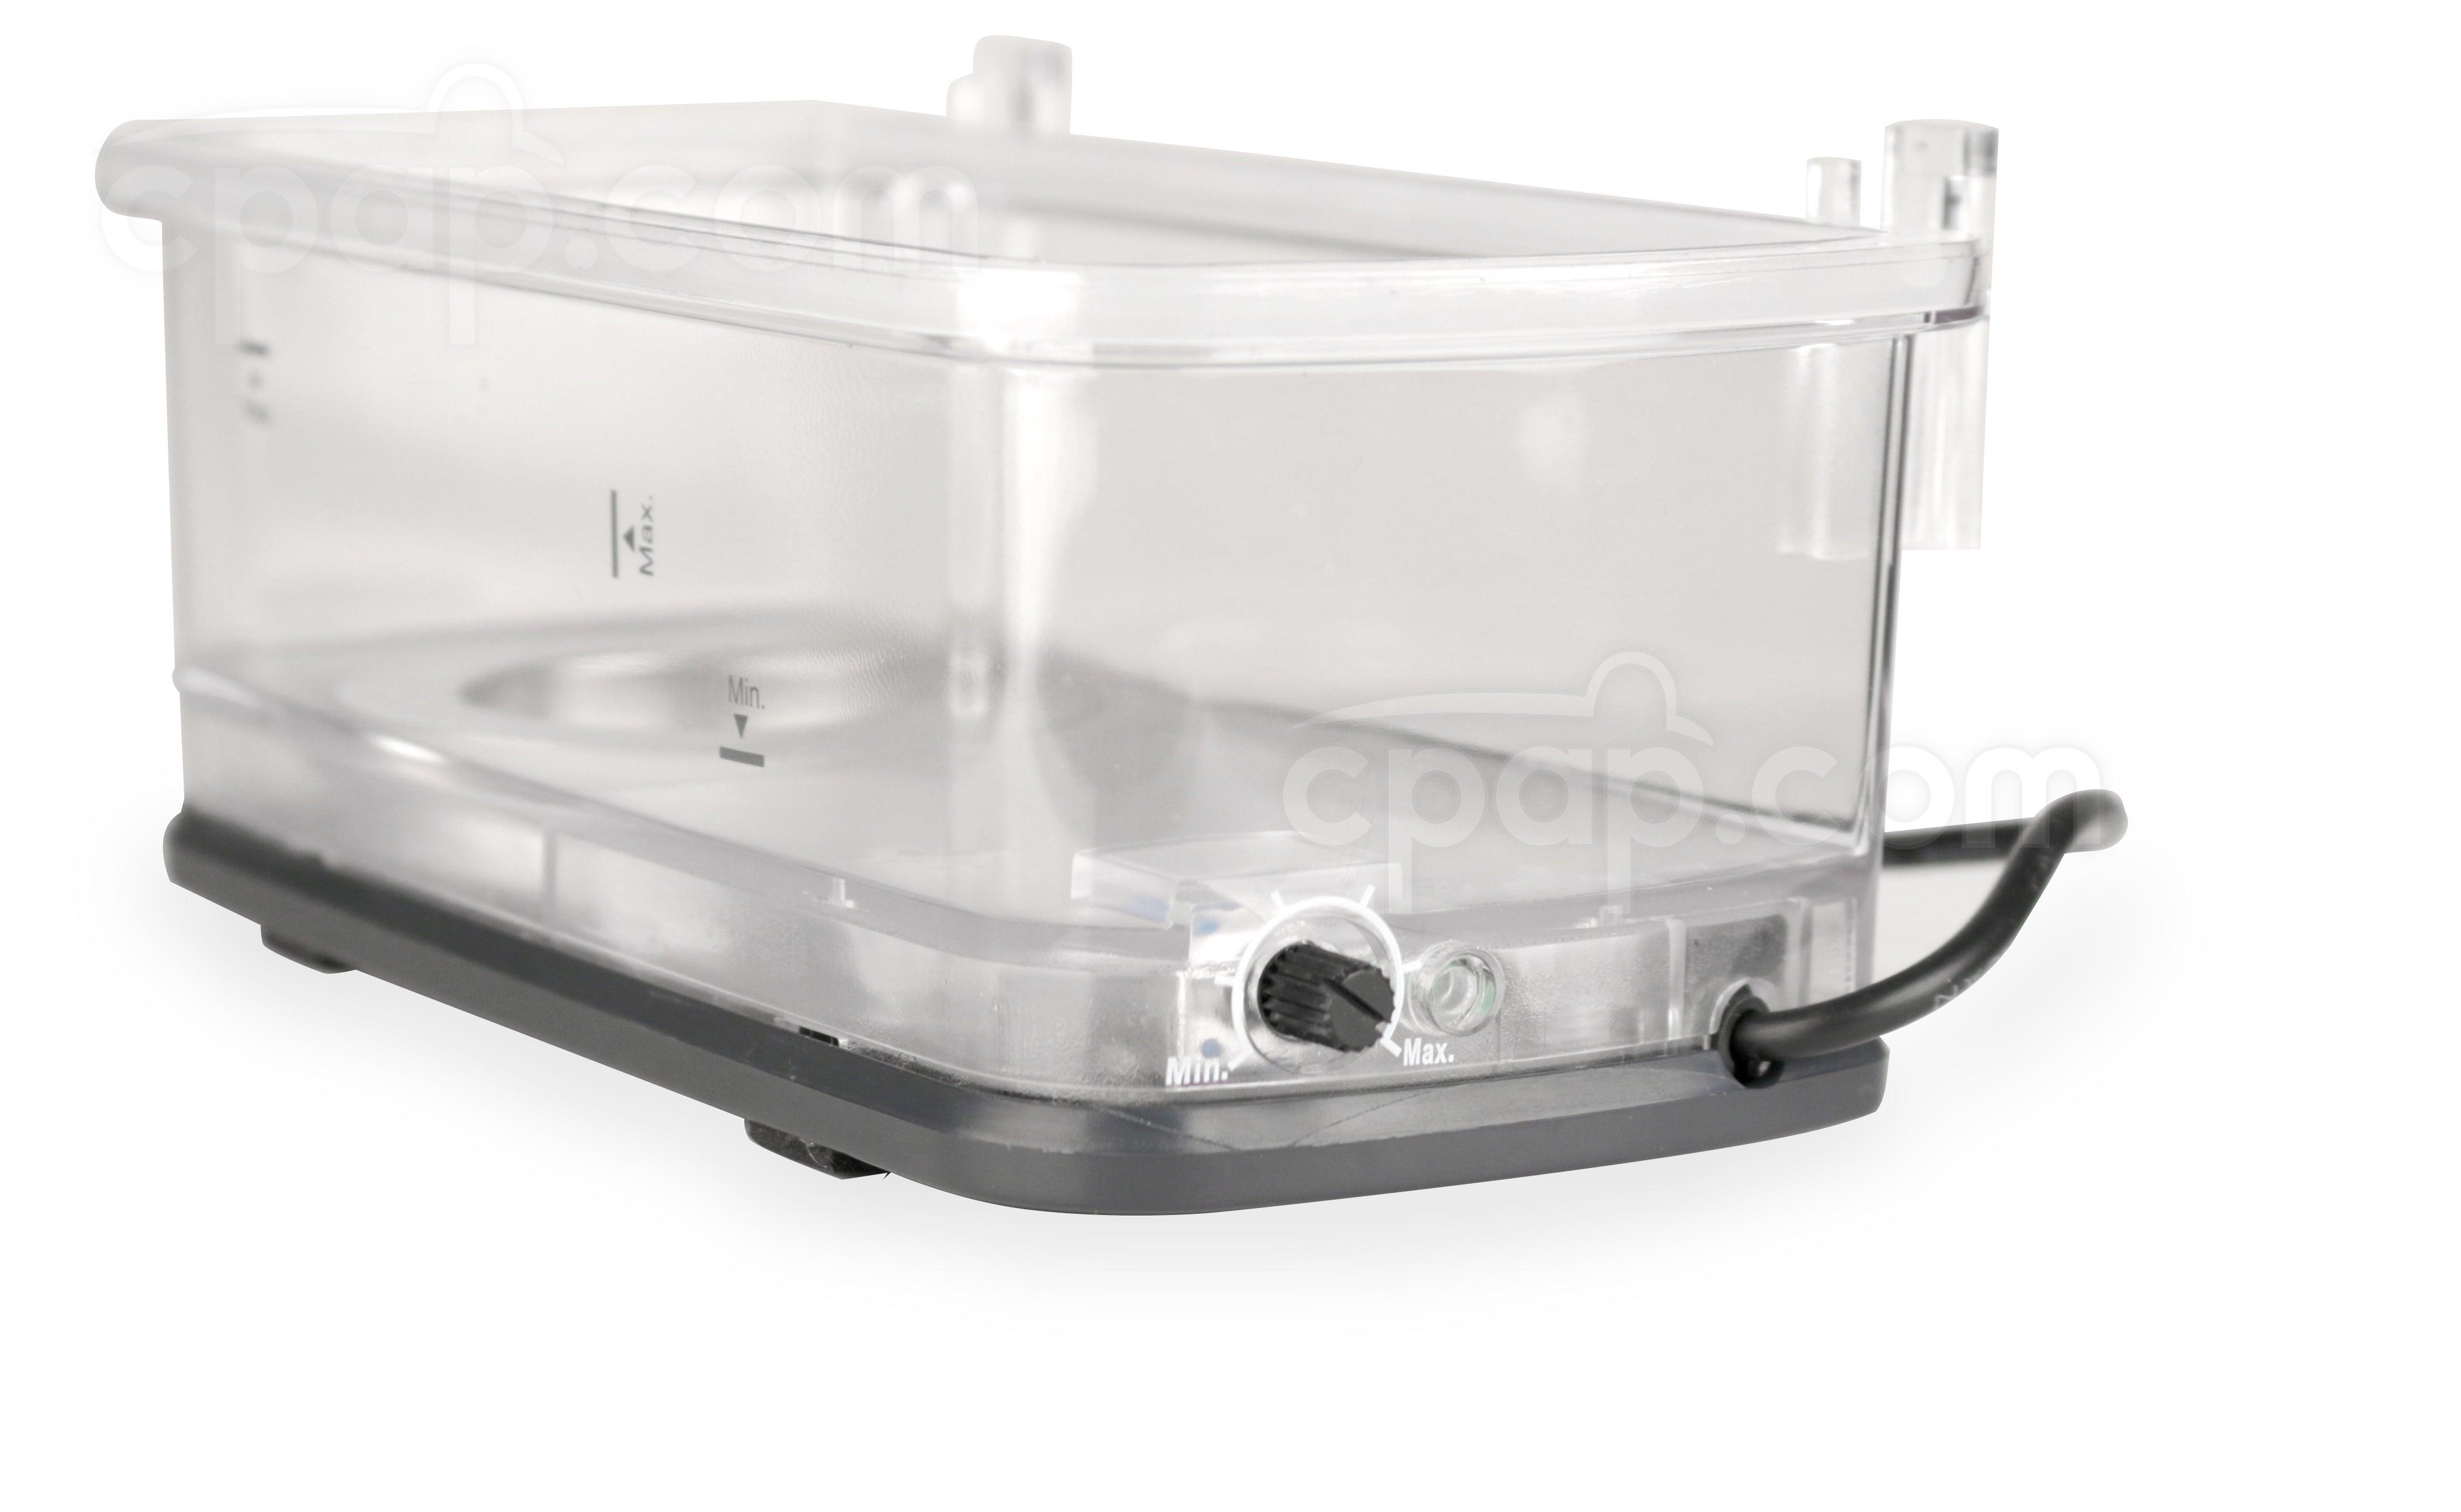 Humidifier Bottom for Curasa